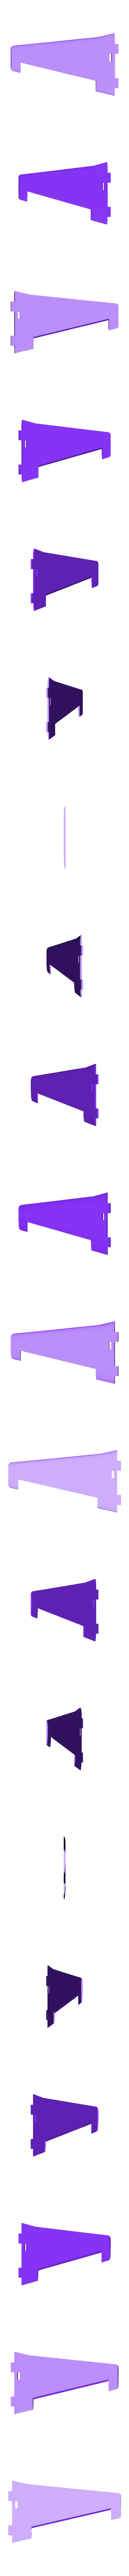 Wing 1 Rev01.STL Download free STL file V1 Release - New RC Plane • 3D printable design, Trikonics